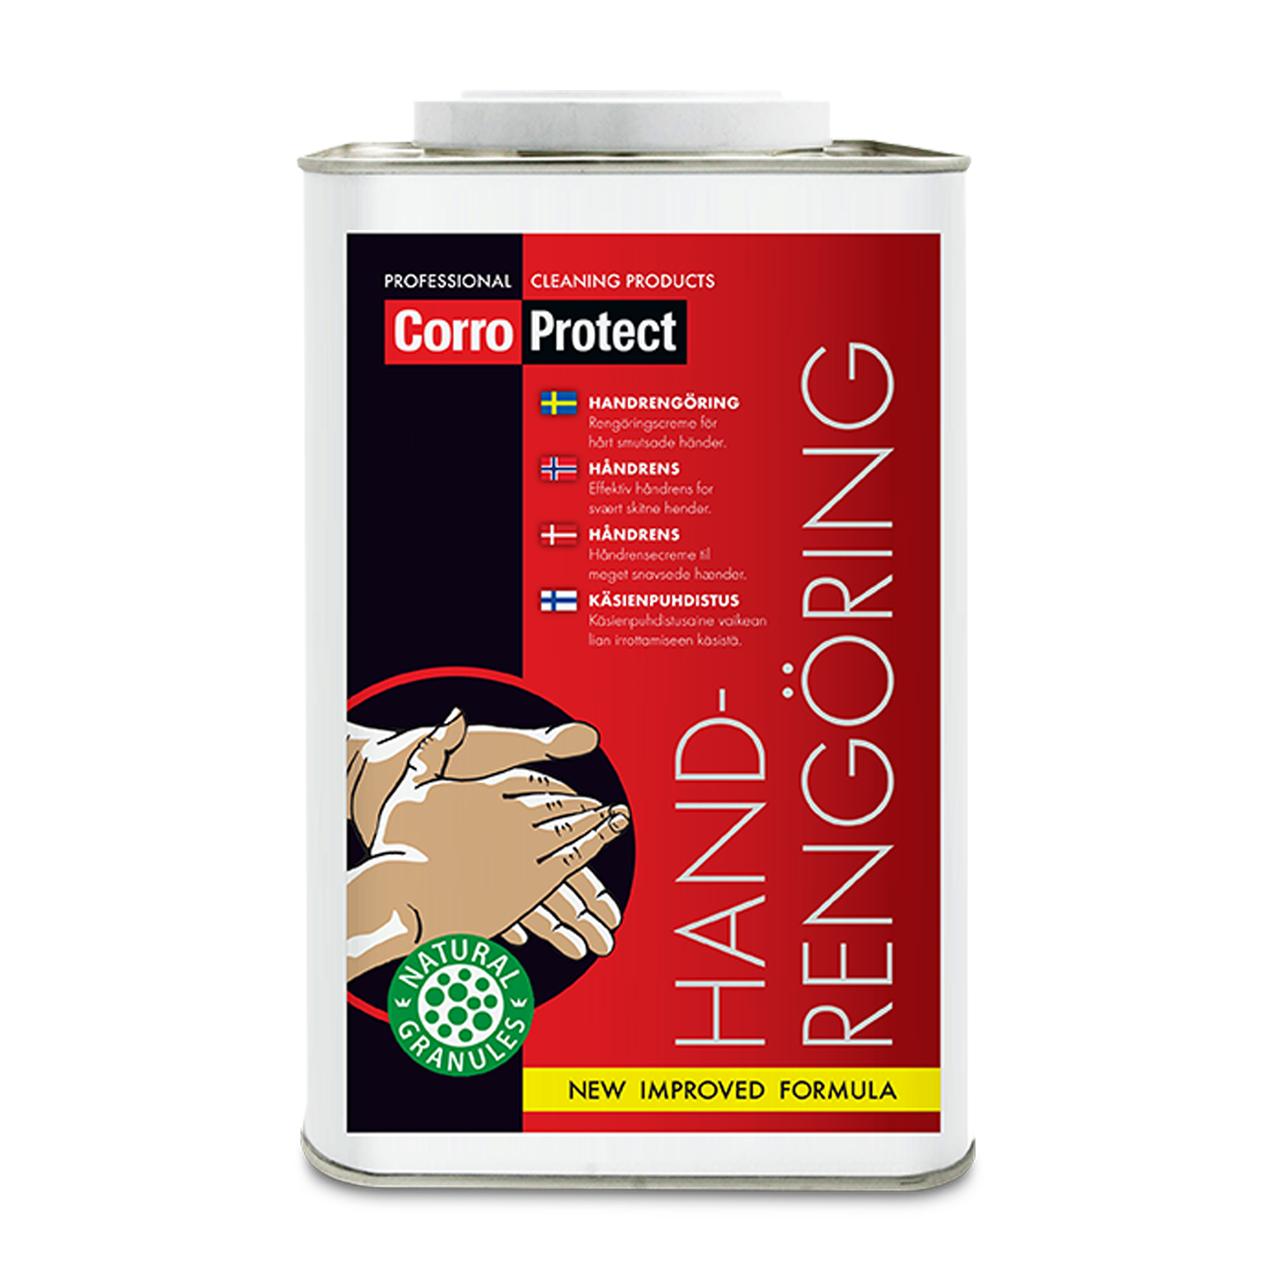 CorroProtect Nettoyant pour les Mains CorroProtect 4,5L